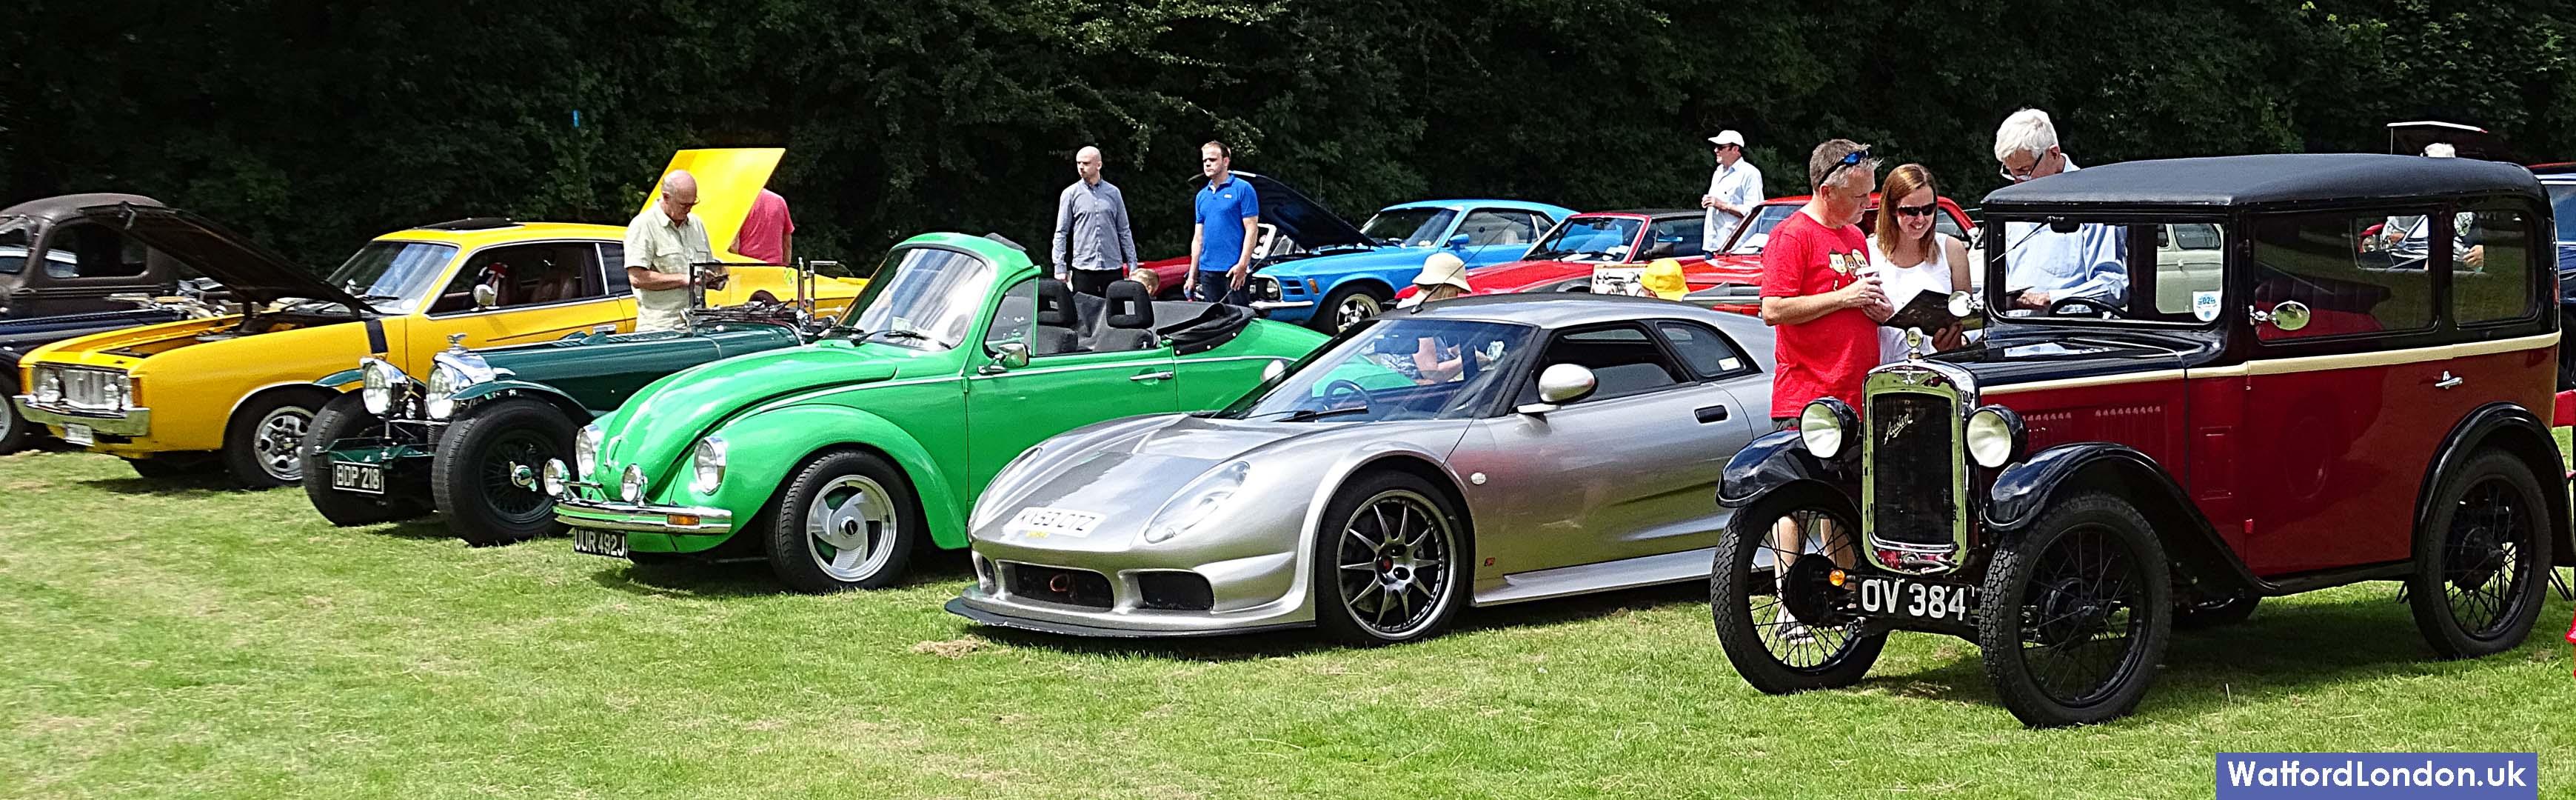 Chorleywood Classic & Ferrari Supercar Show Hertfordshire 2016